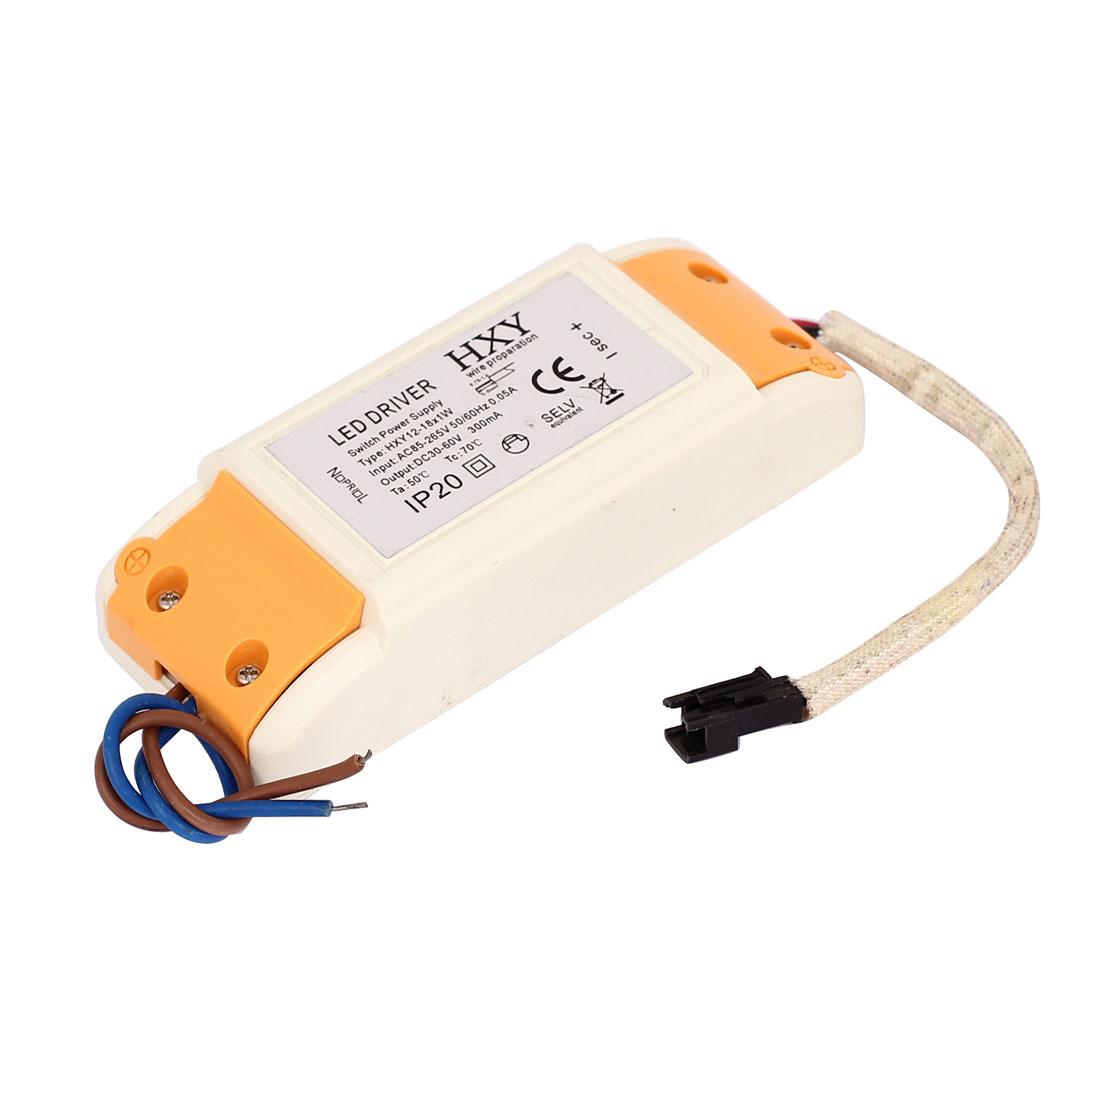 AC 85-265V DC 30-60V 300mA 12-18x1W LED Strip Light Driver Power Supply Converter Adapter